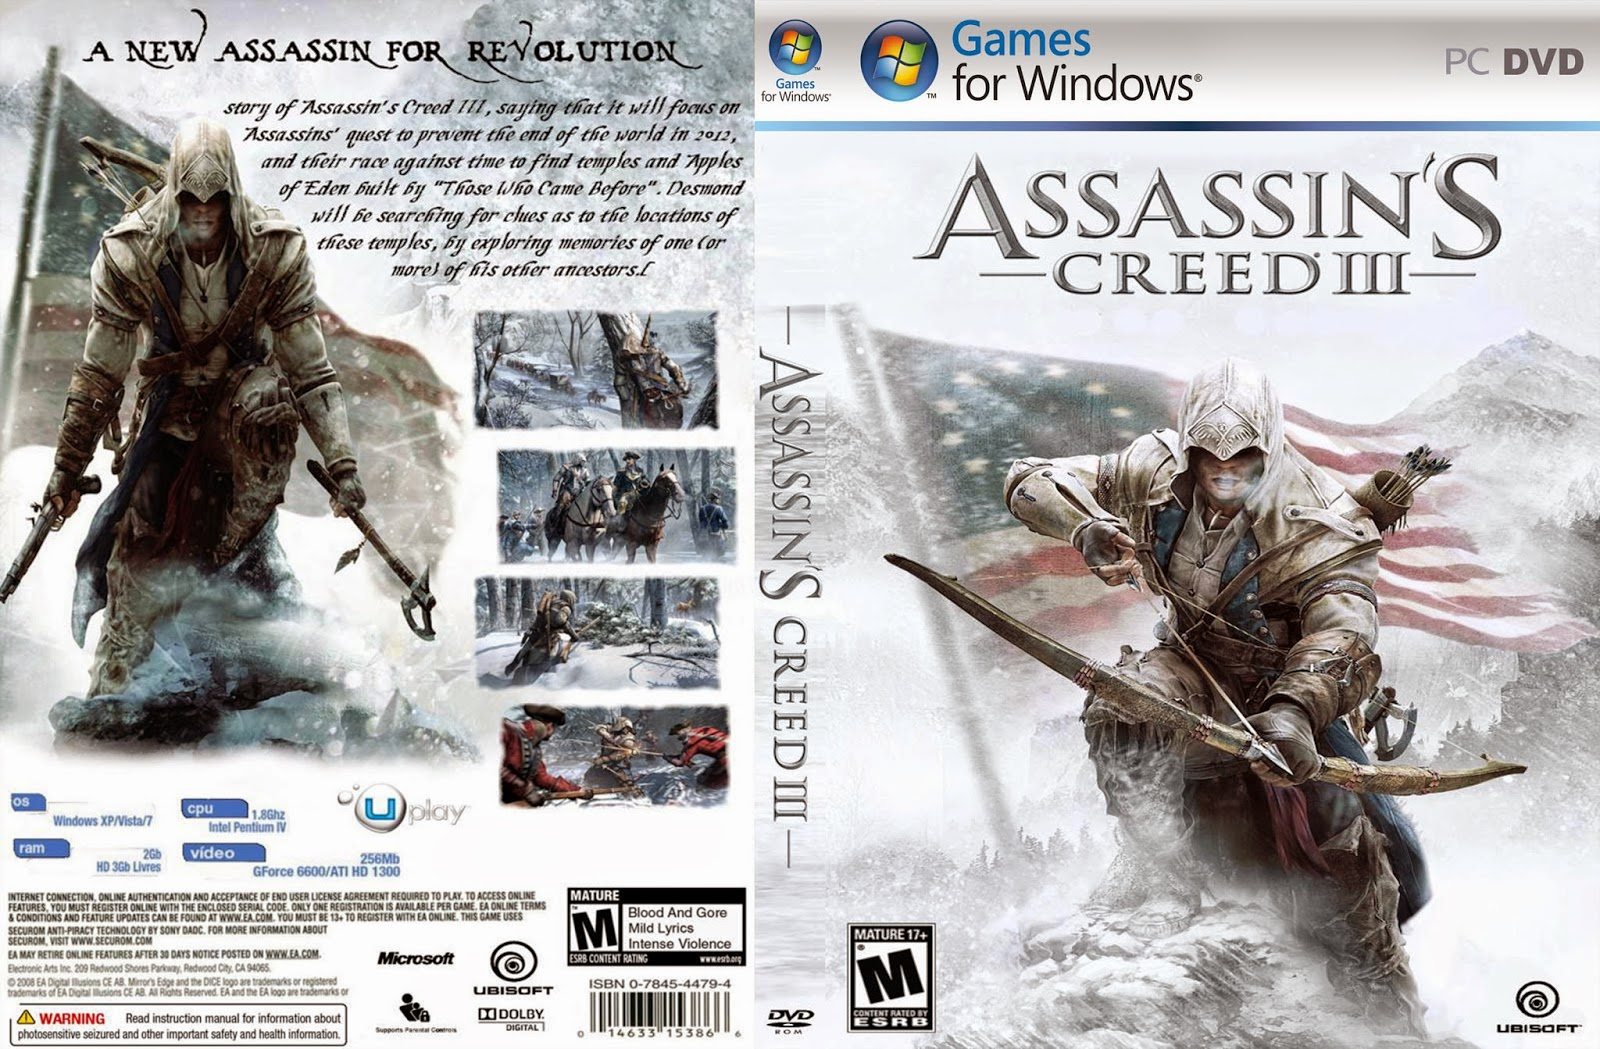 تحميل لعبة assassins creed 3 برابط واحد مباشر